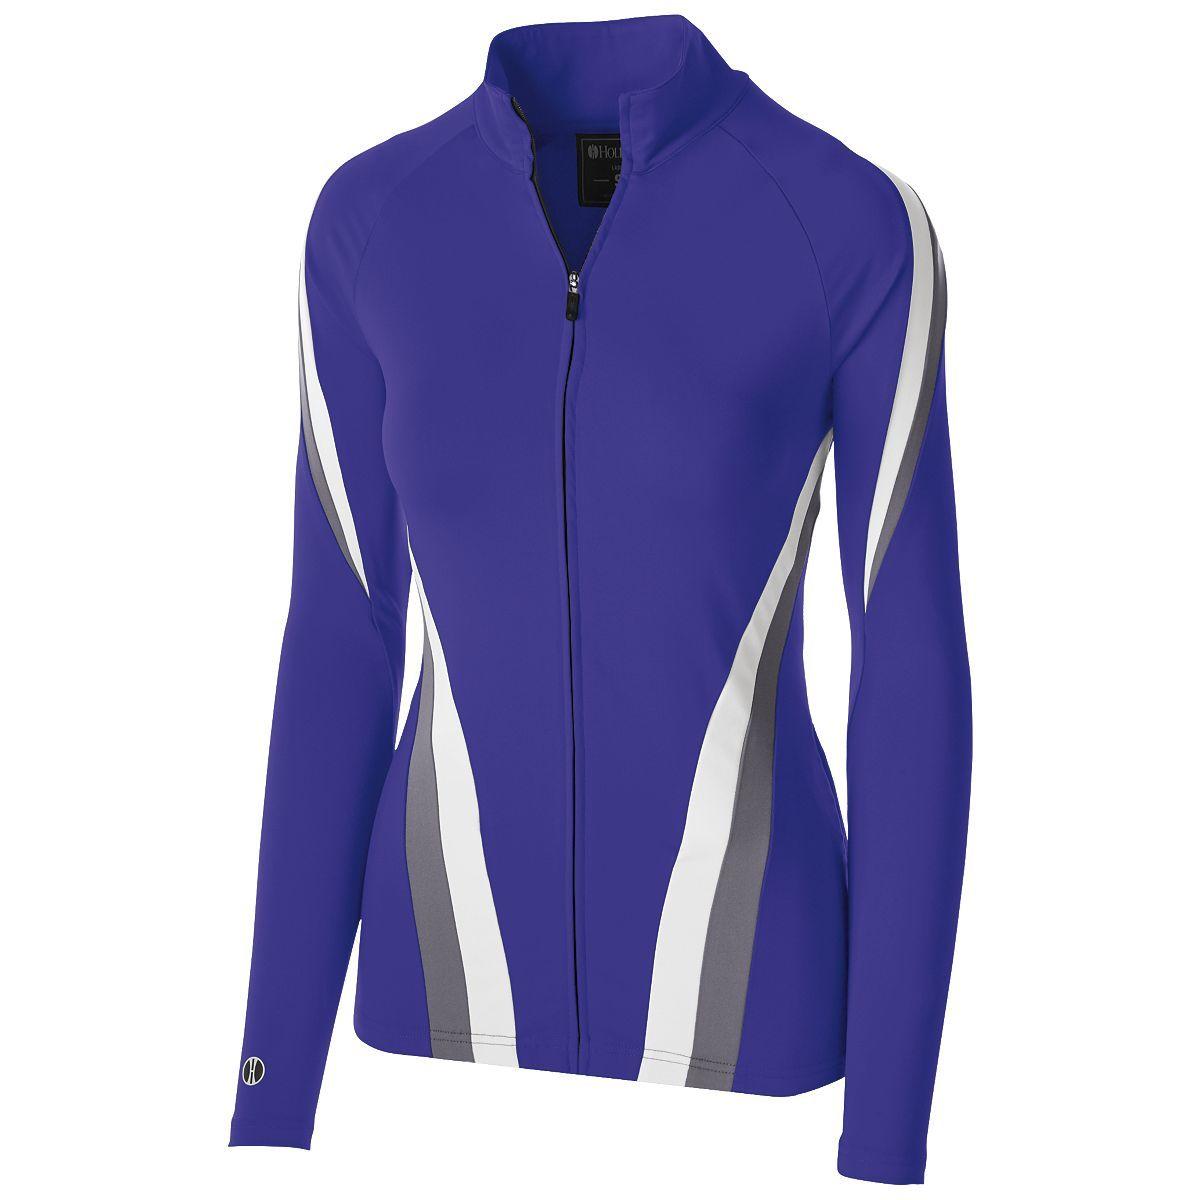 Ladies Aerial Jacket - Purple/graphite/white